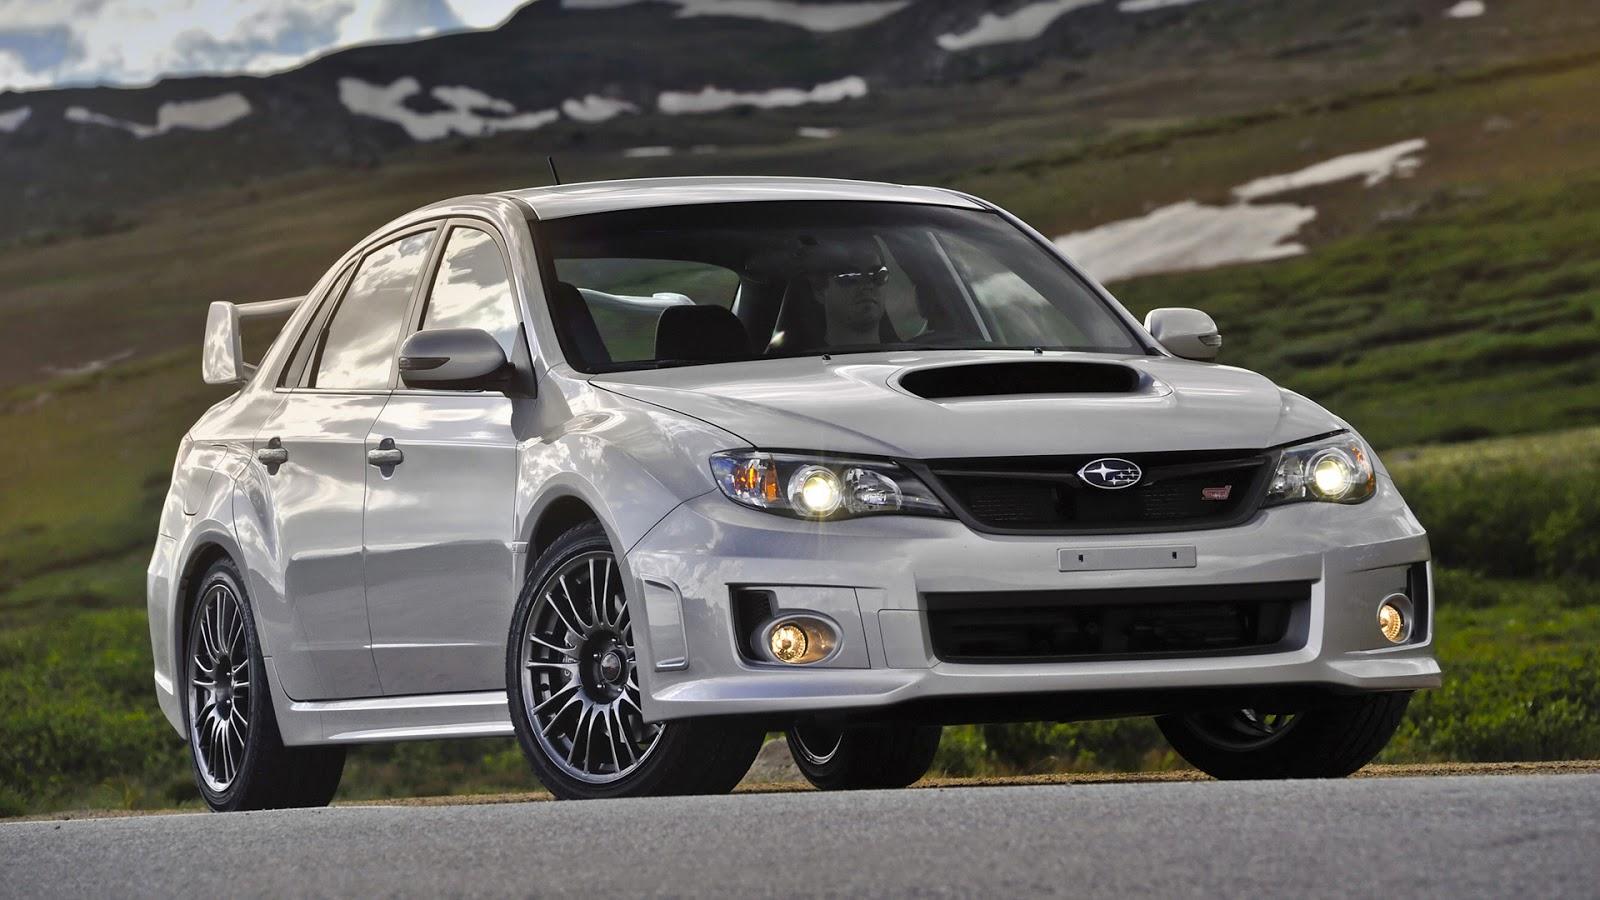 2013 Subaru Impreza WRX STI AWD 2.5 Boxer-4 Turbo 305 hp | Carwp.